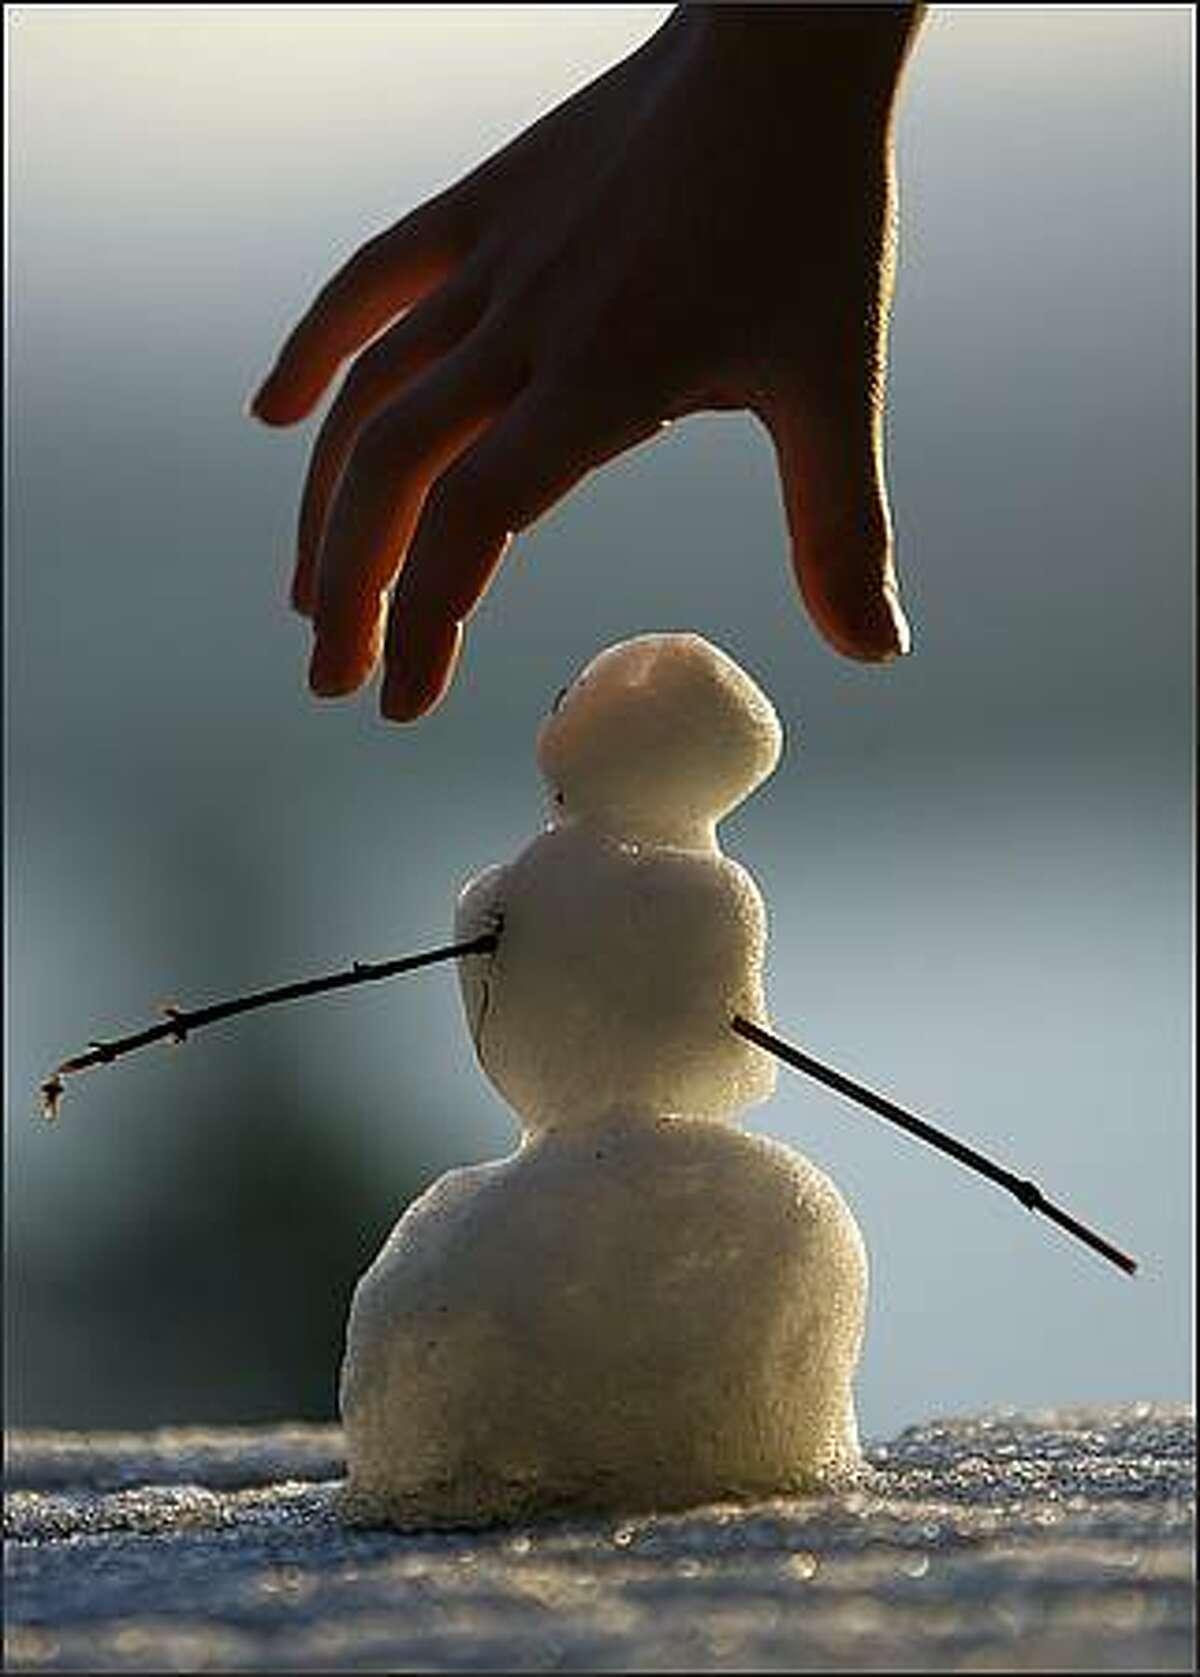 Big snowman, little hand. Photographed on Vashon Island.